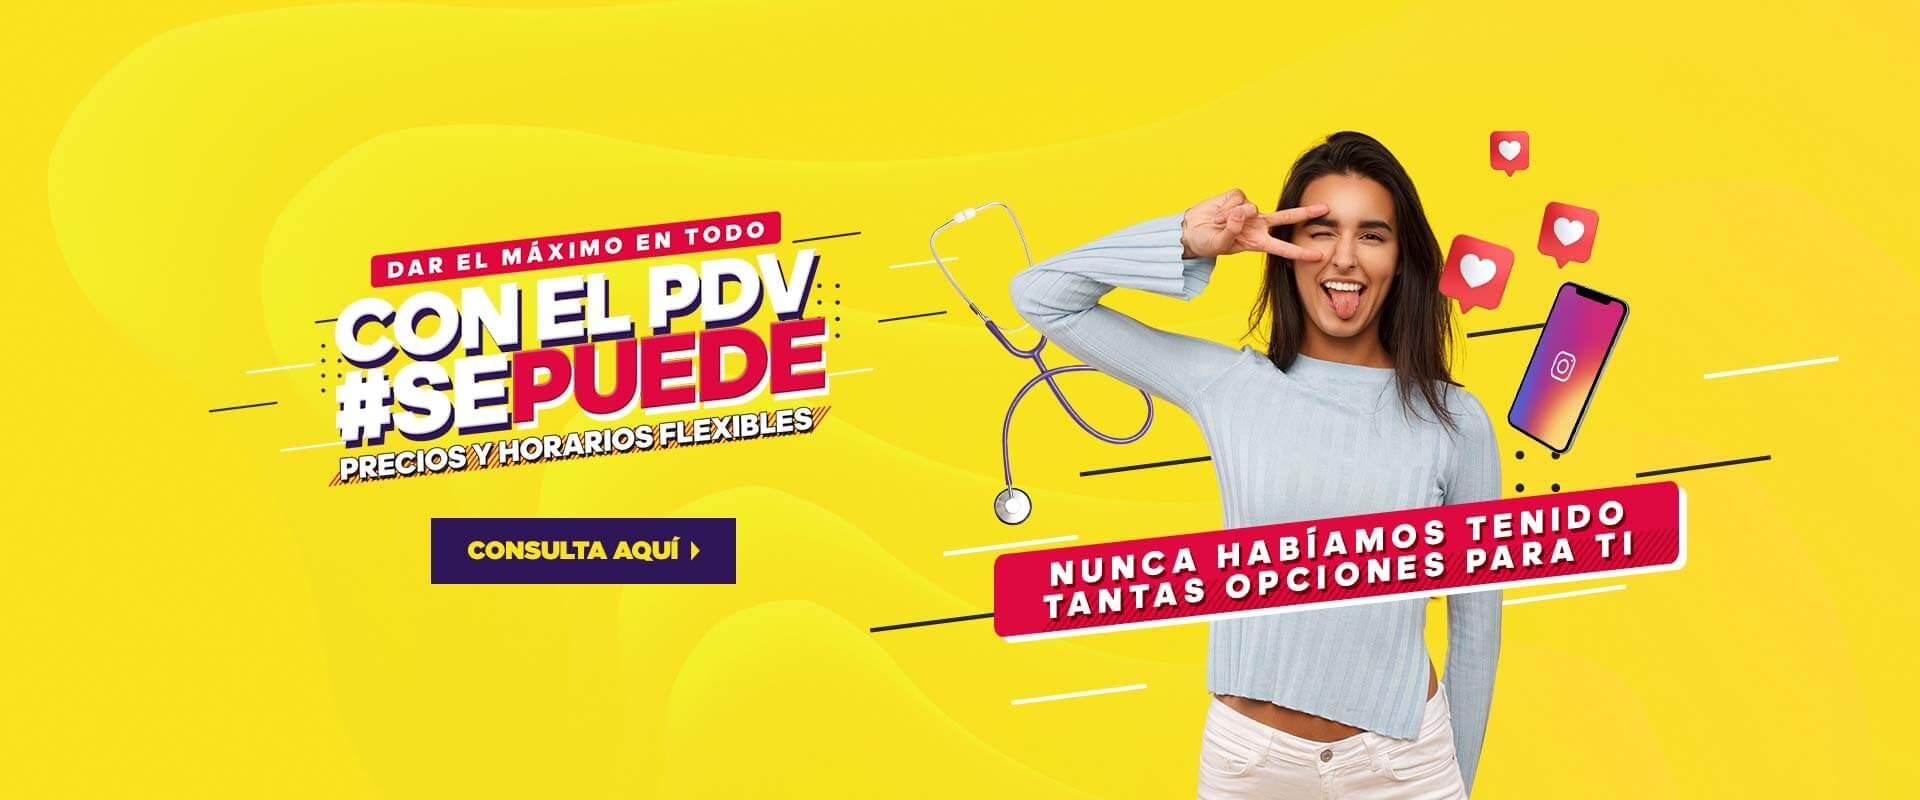 Intensivo 2019 - Preuniversitario Pedro de Valdivia